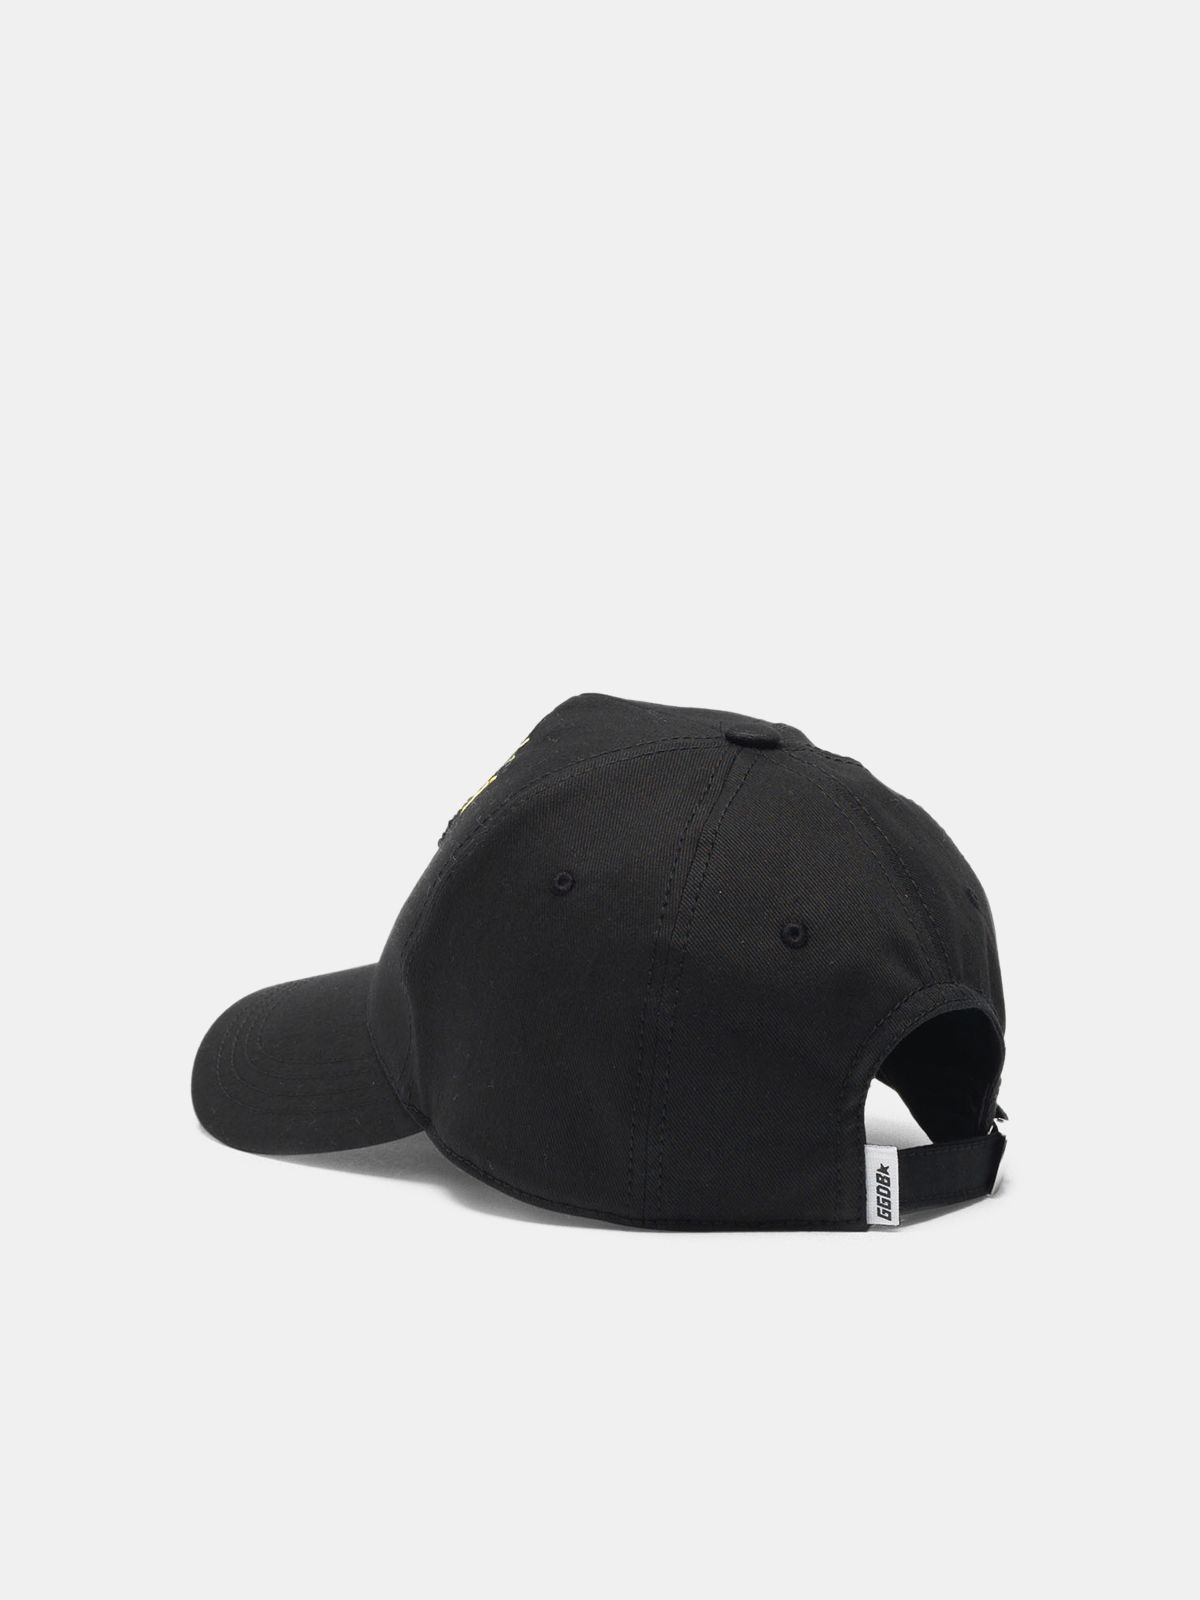 Golden Goose - Larry black baseball cap with logo in